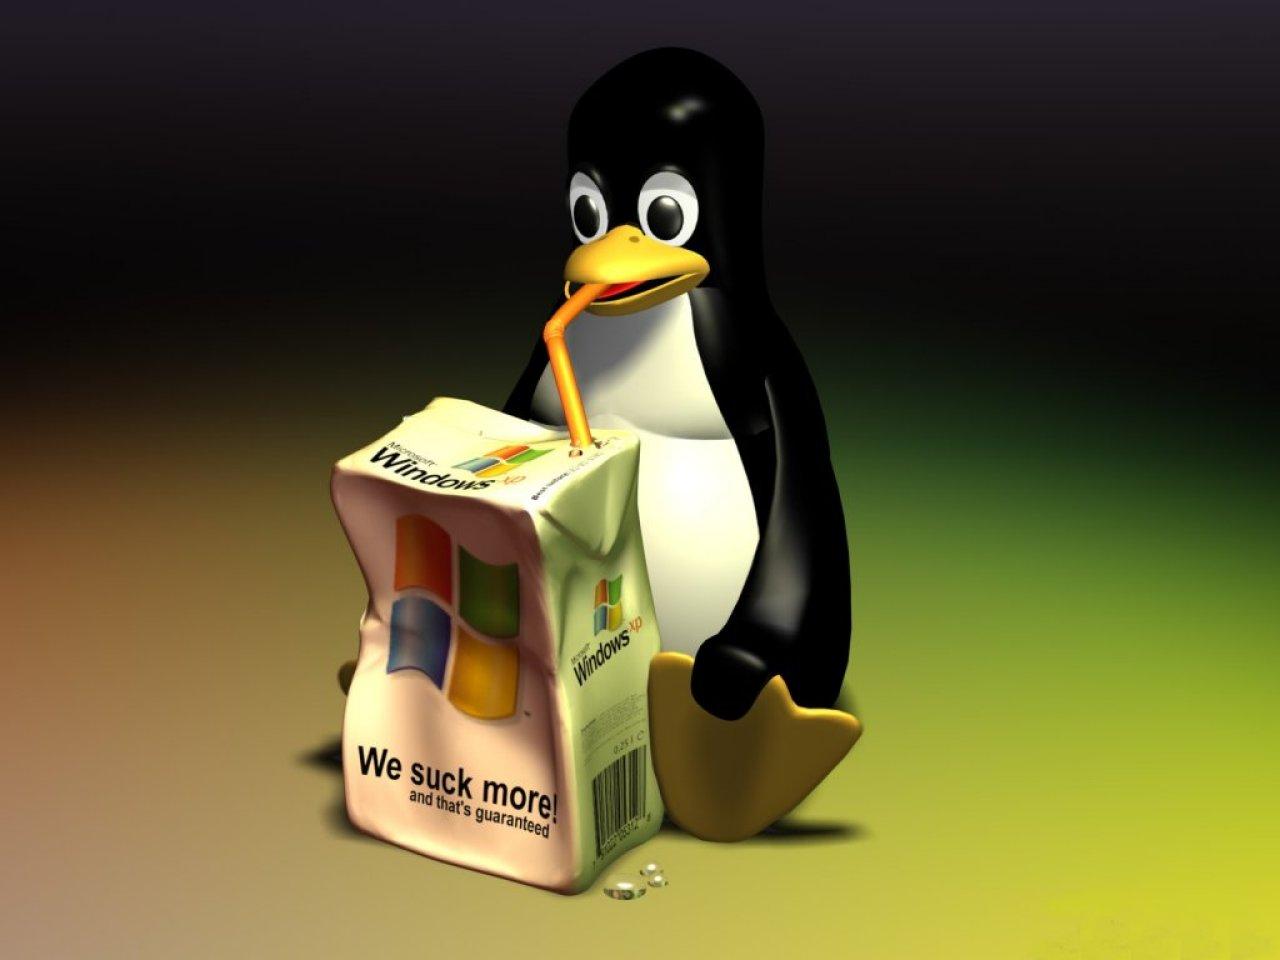 winxp-linux